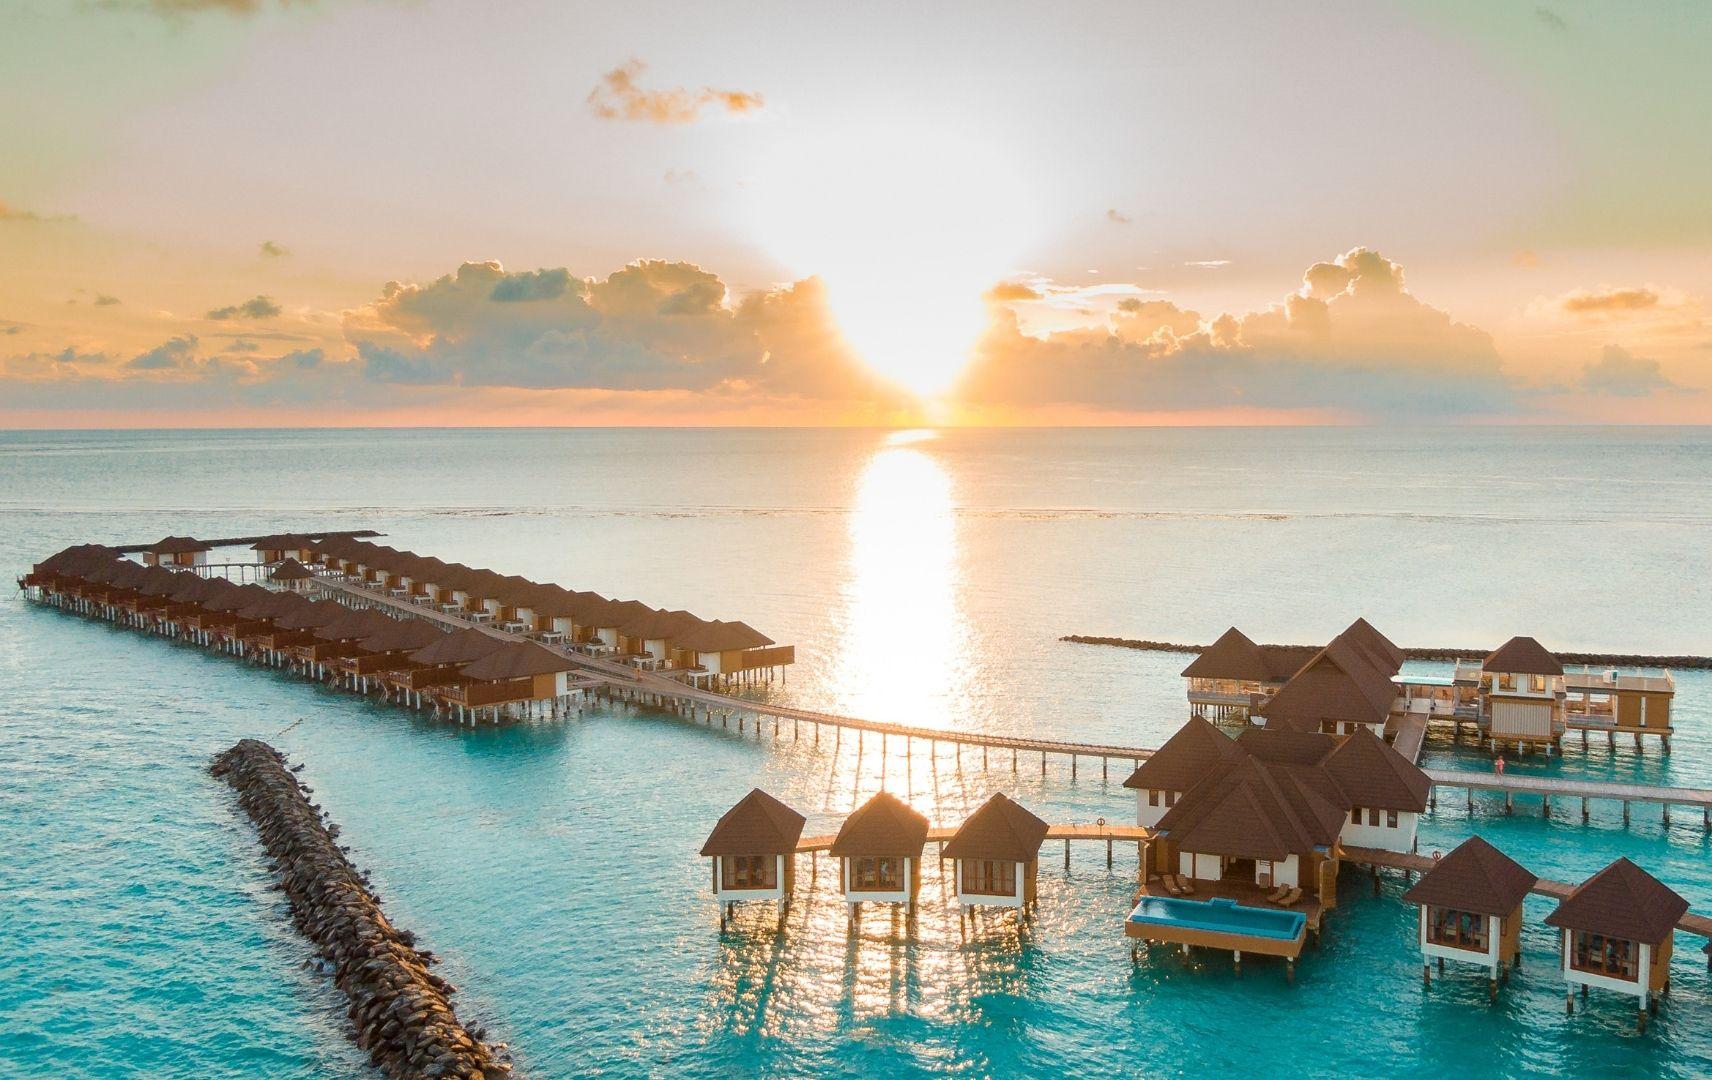 Hotel Malediven